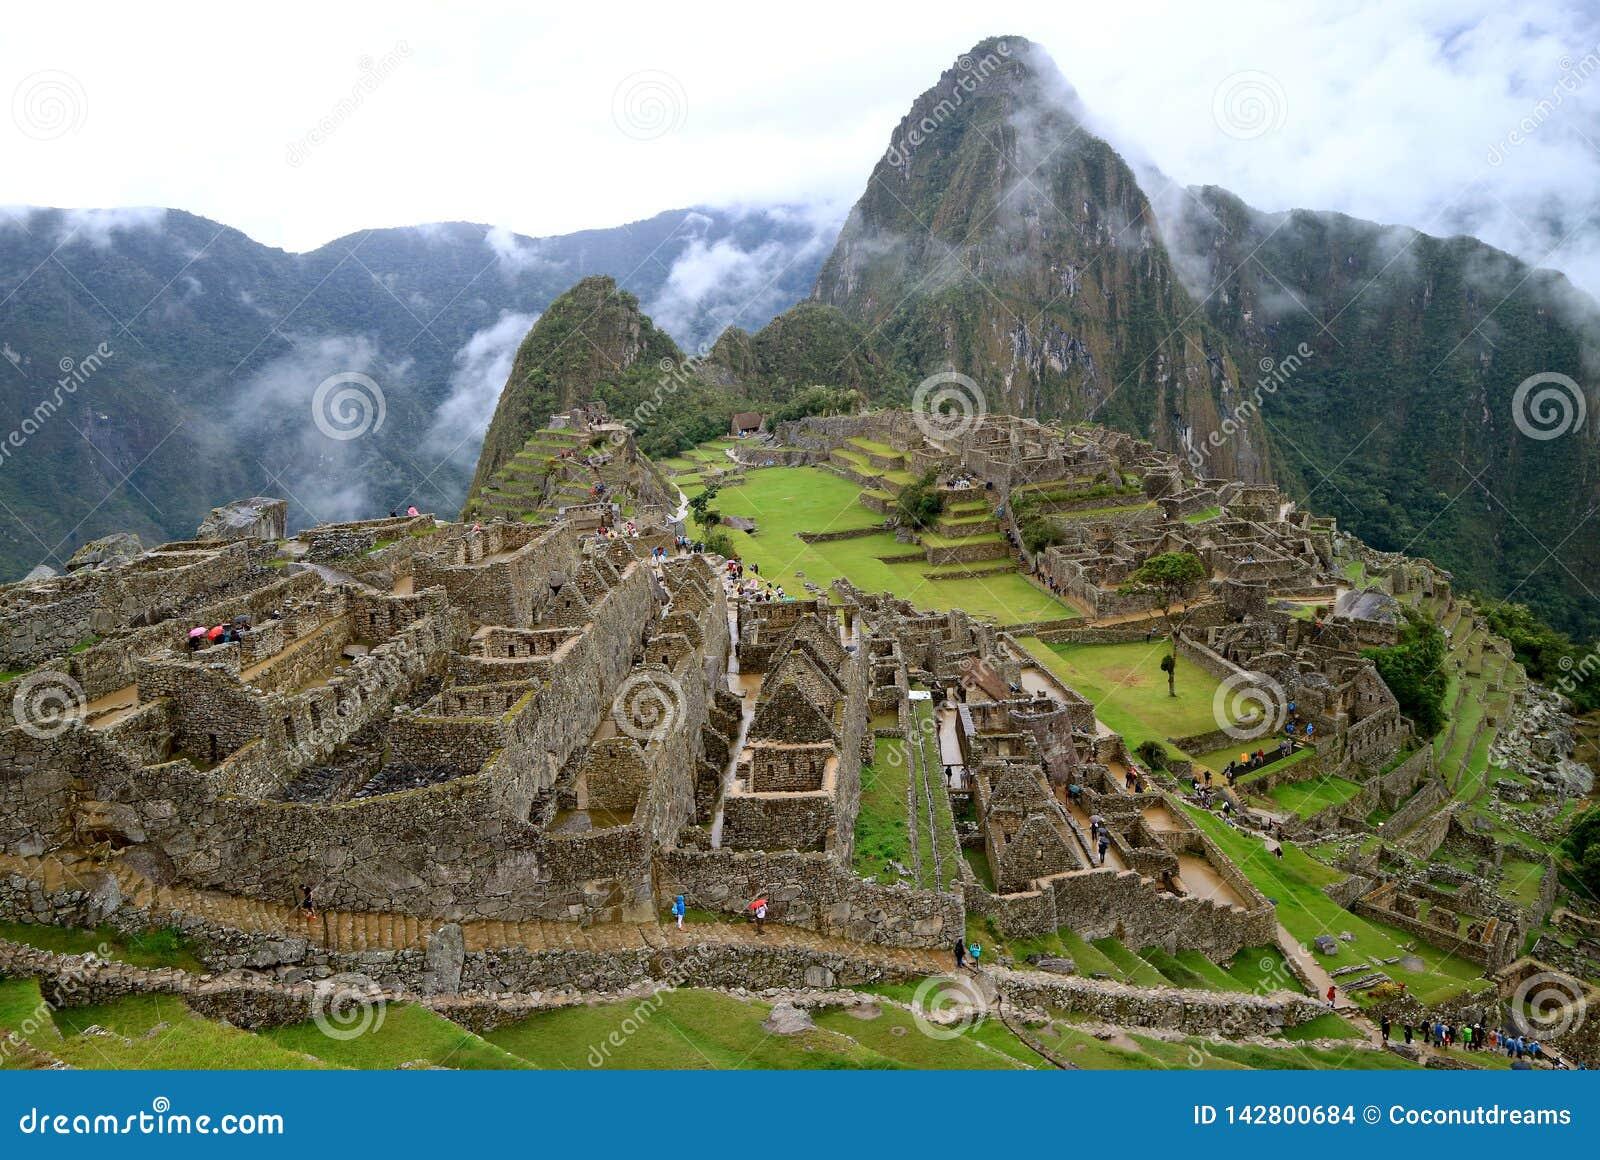 Machu Picchu arkeologisk plats, den mystiska Inca Fortress Ruins i regnet, Cusco region, Peru